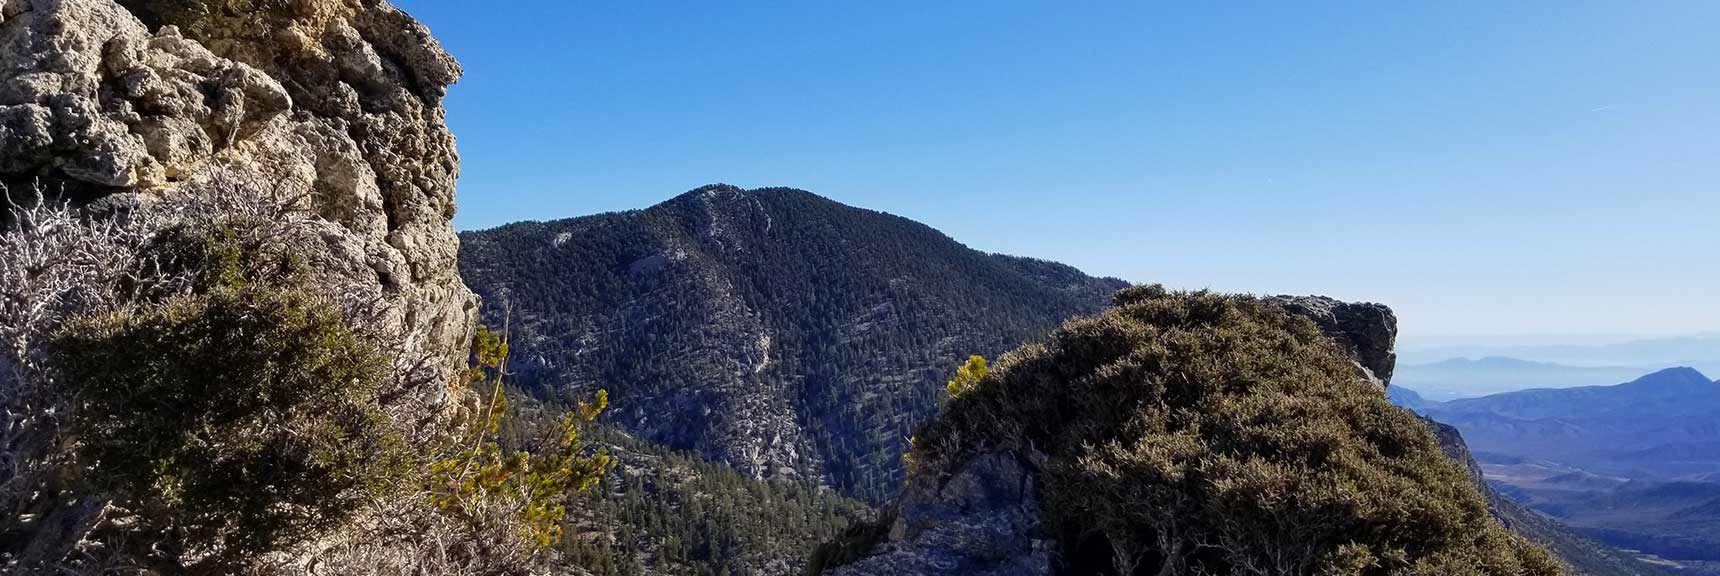 Fletcher Peak Viewed from Cockscomb Ridge in Mt. Charleston Wilderness, Nevada